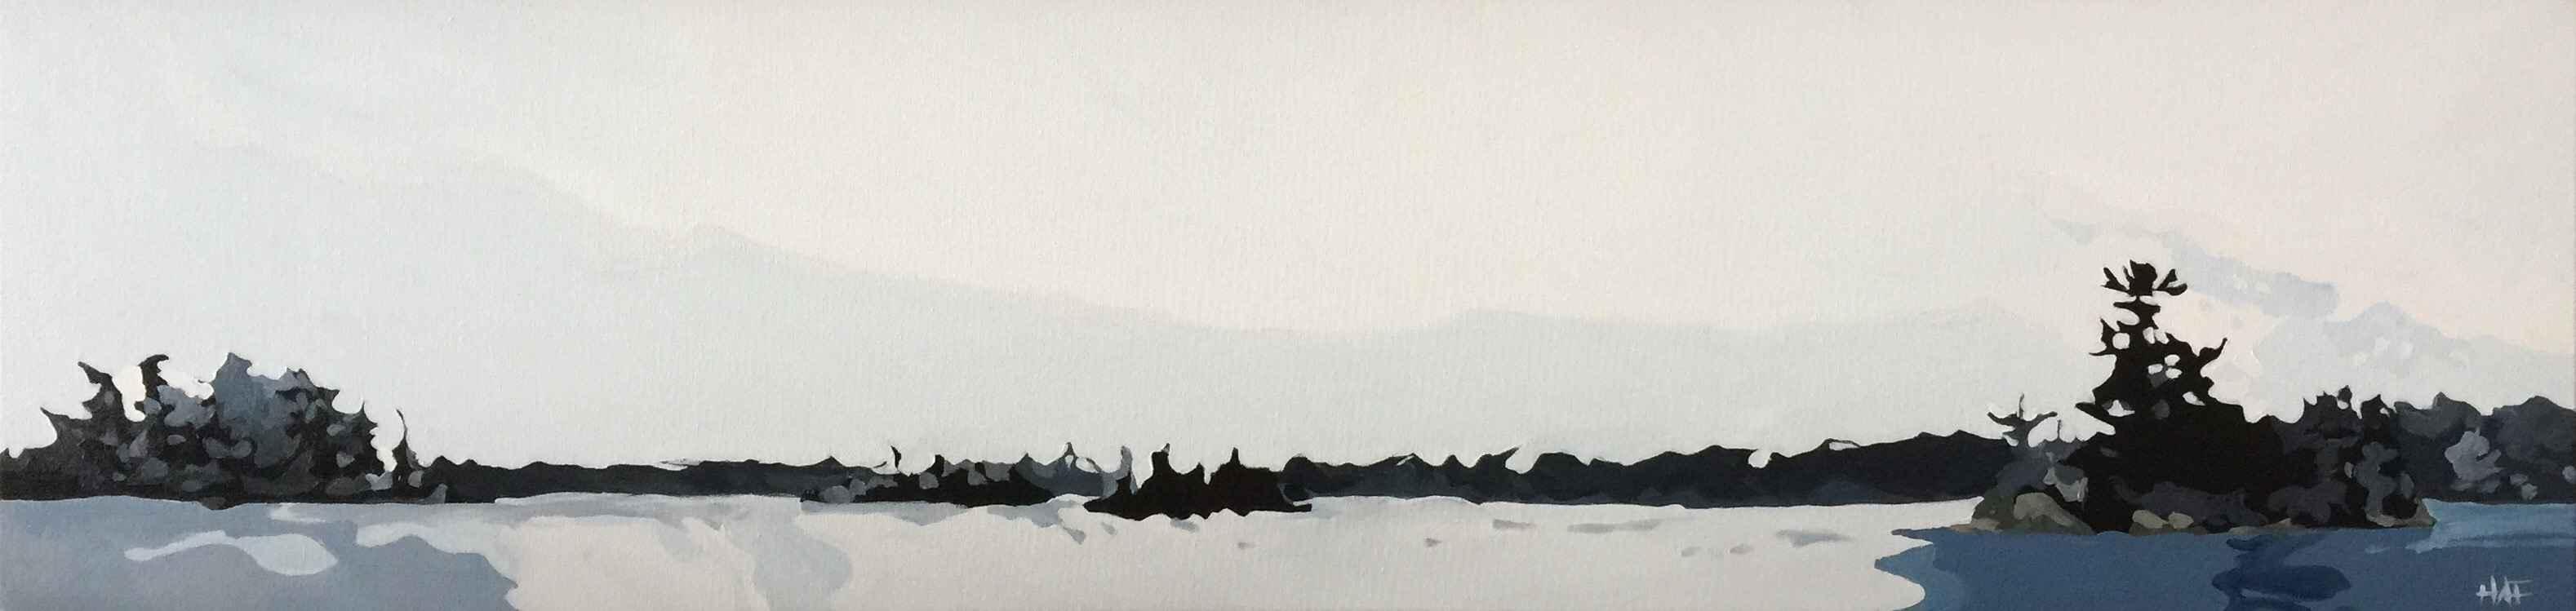 LOTW Pass by  Holly Ann Friesen - Masterpiece Online